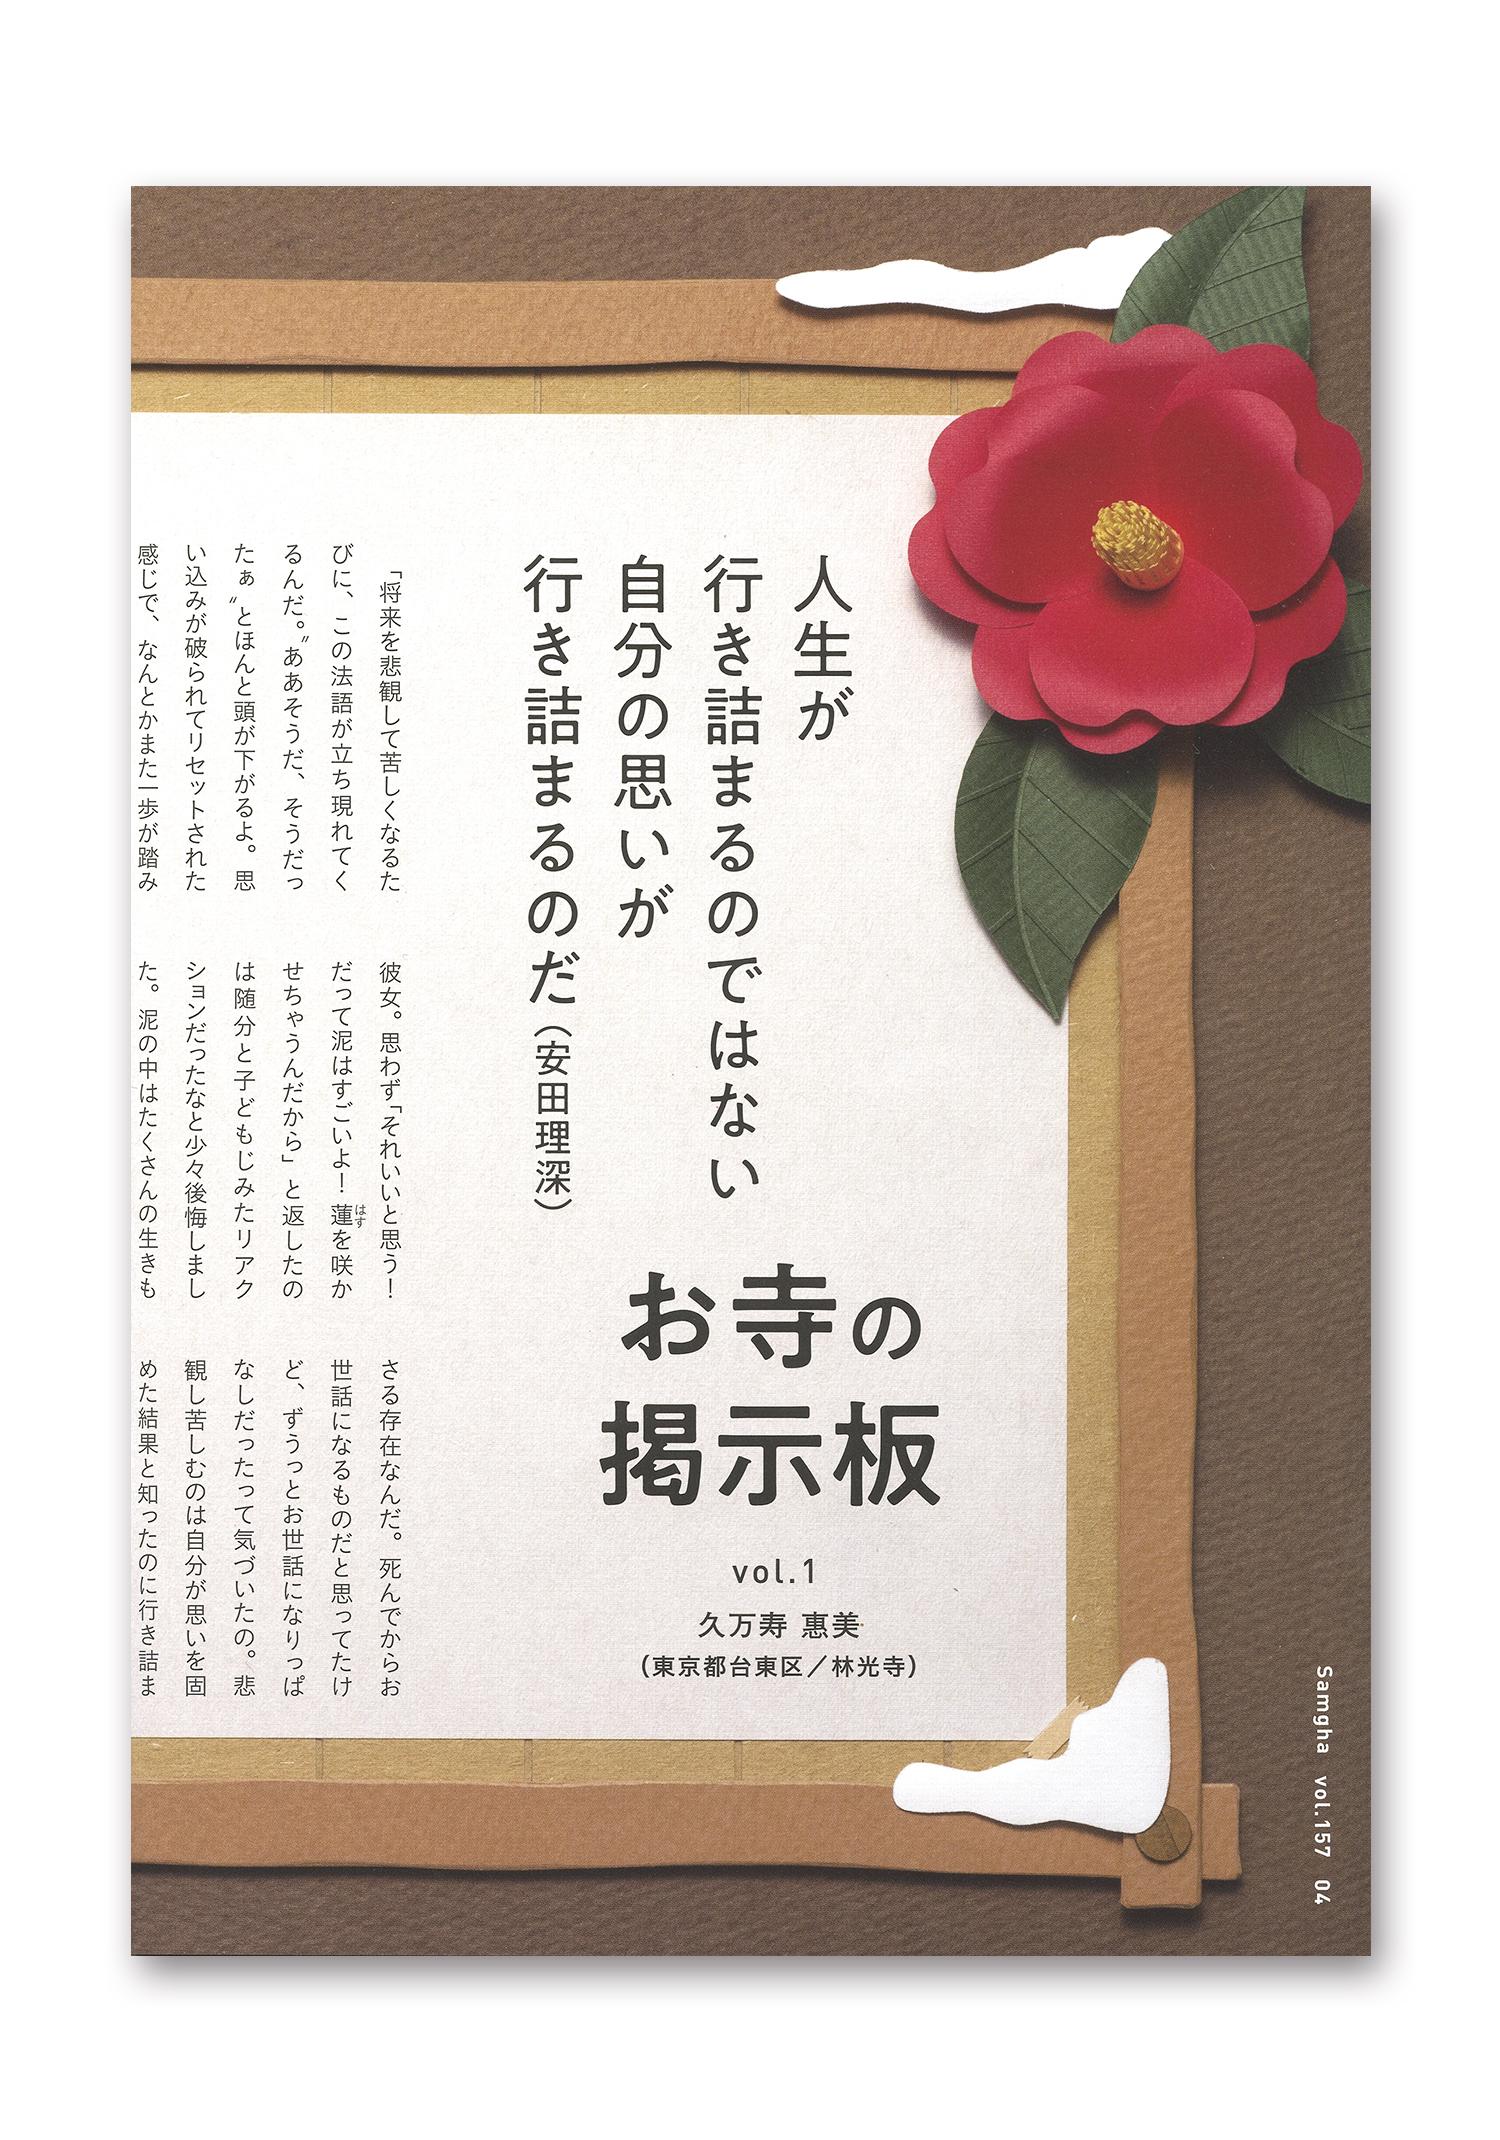 京都東本願寺広報誌『サンガ』